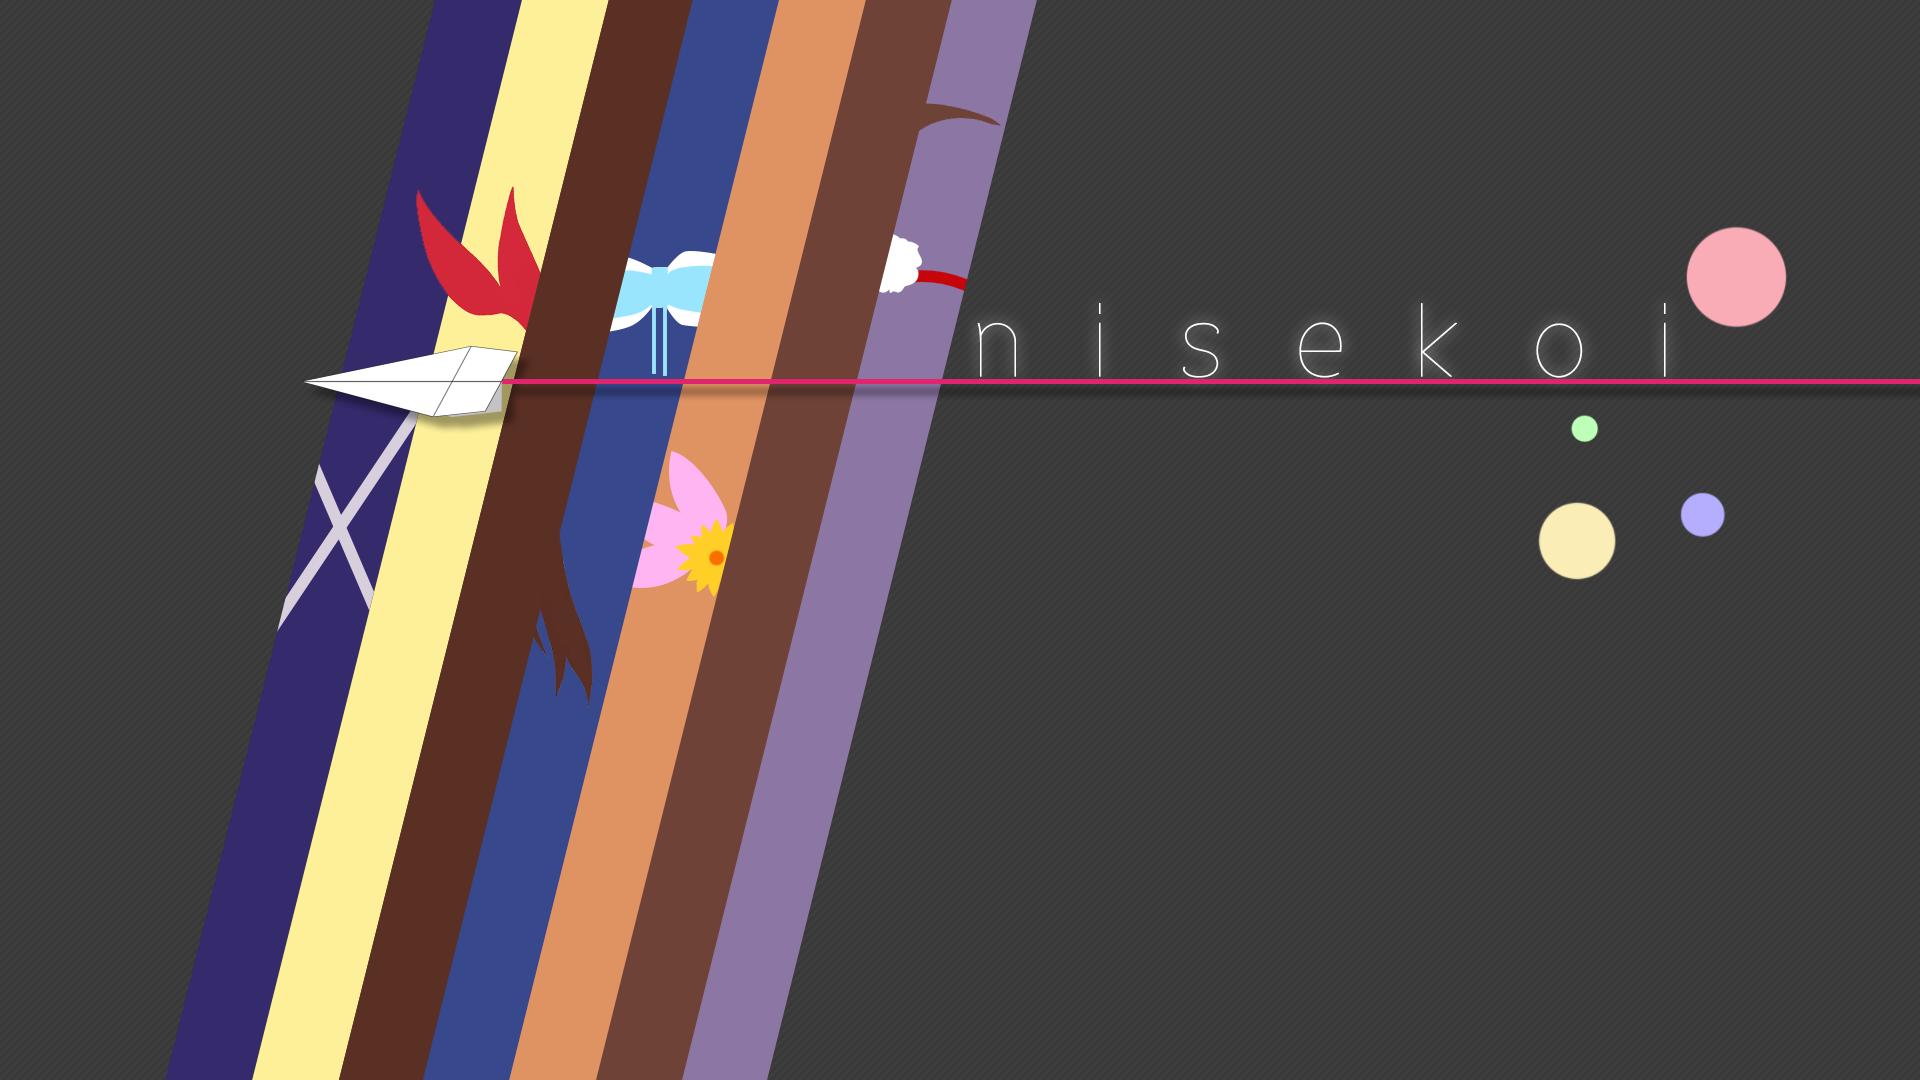 nisekoi wallpaper iphone